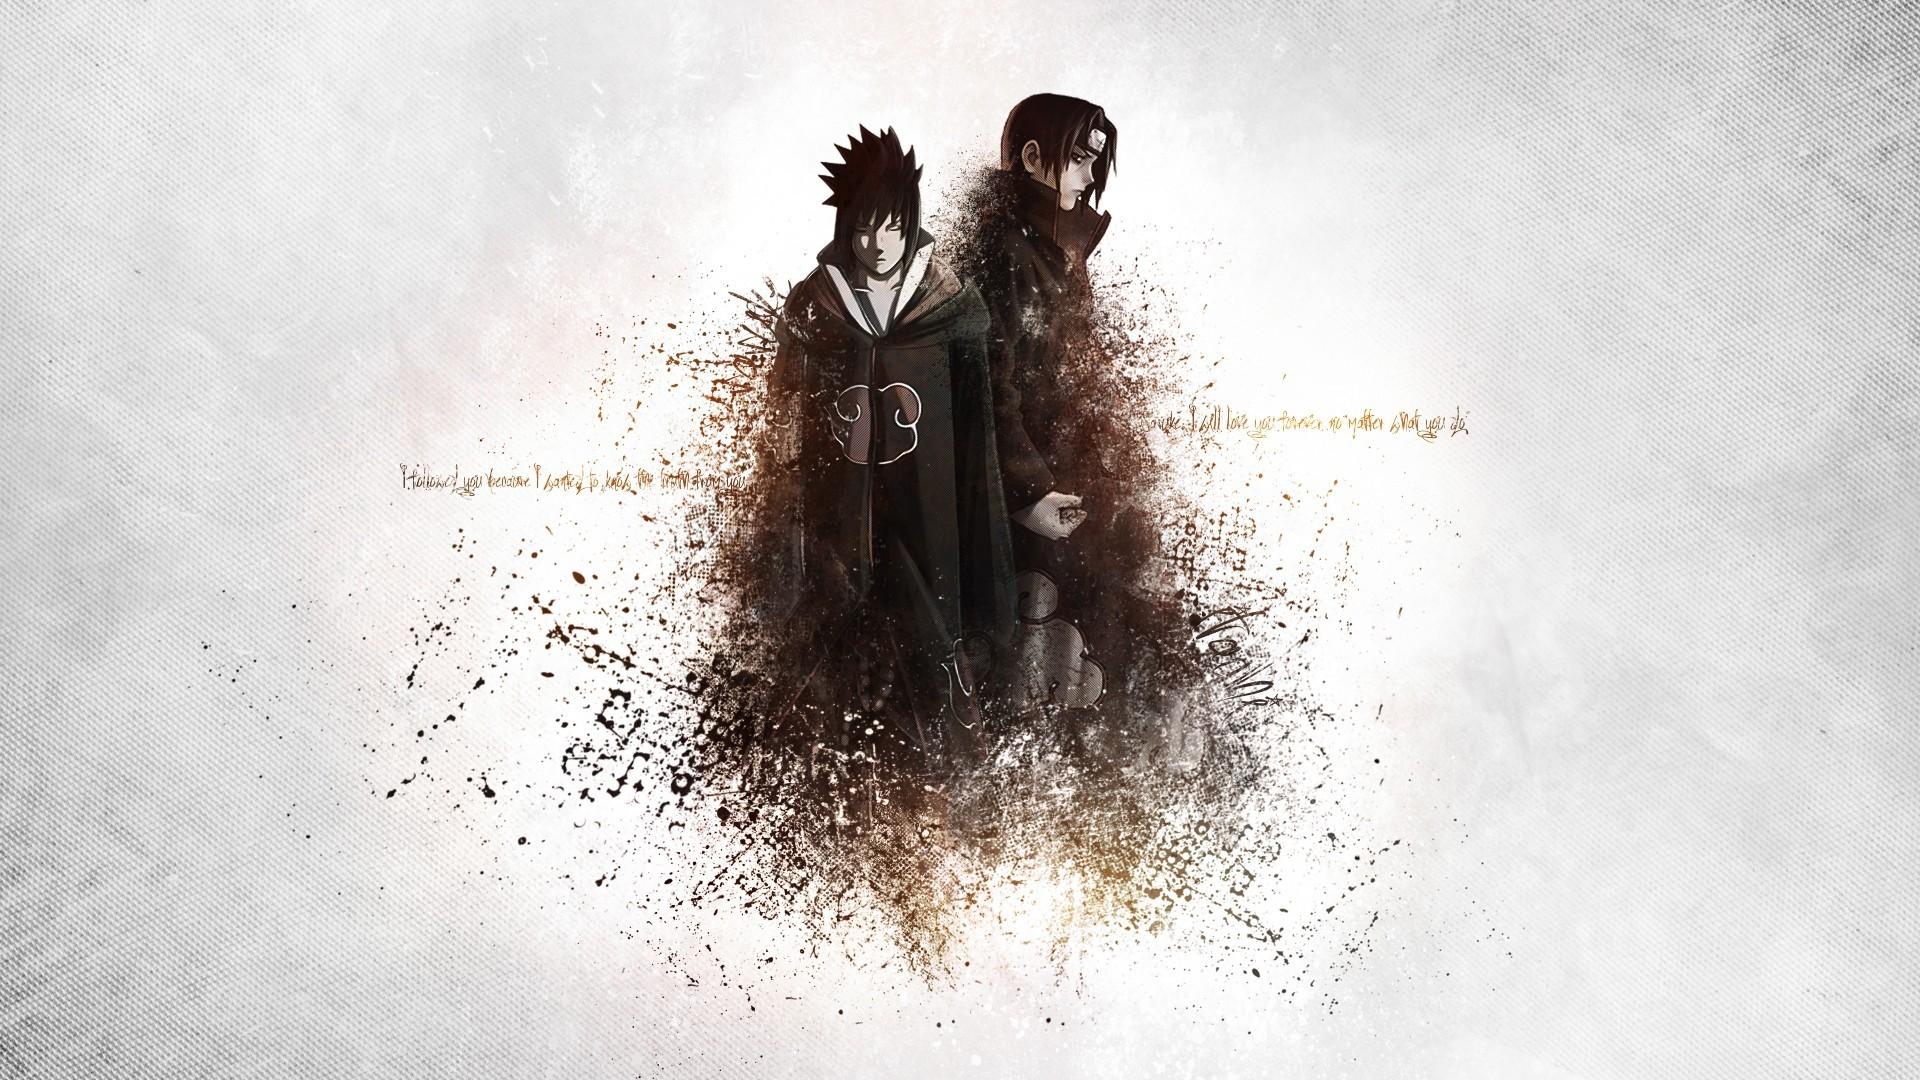 Uchiha Sasuke, Uchiha Itachi, Brothers, Naruto Shippuuden, Akatsuki Wallpapers  HD / Desktop and Mobile Backgrounds